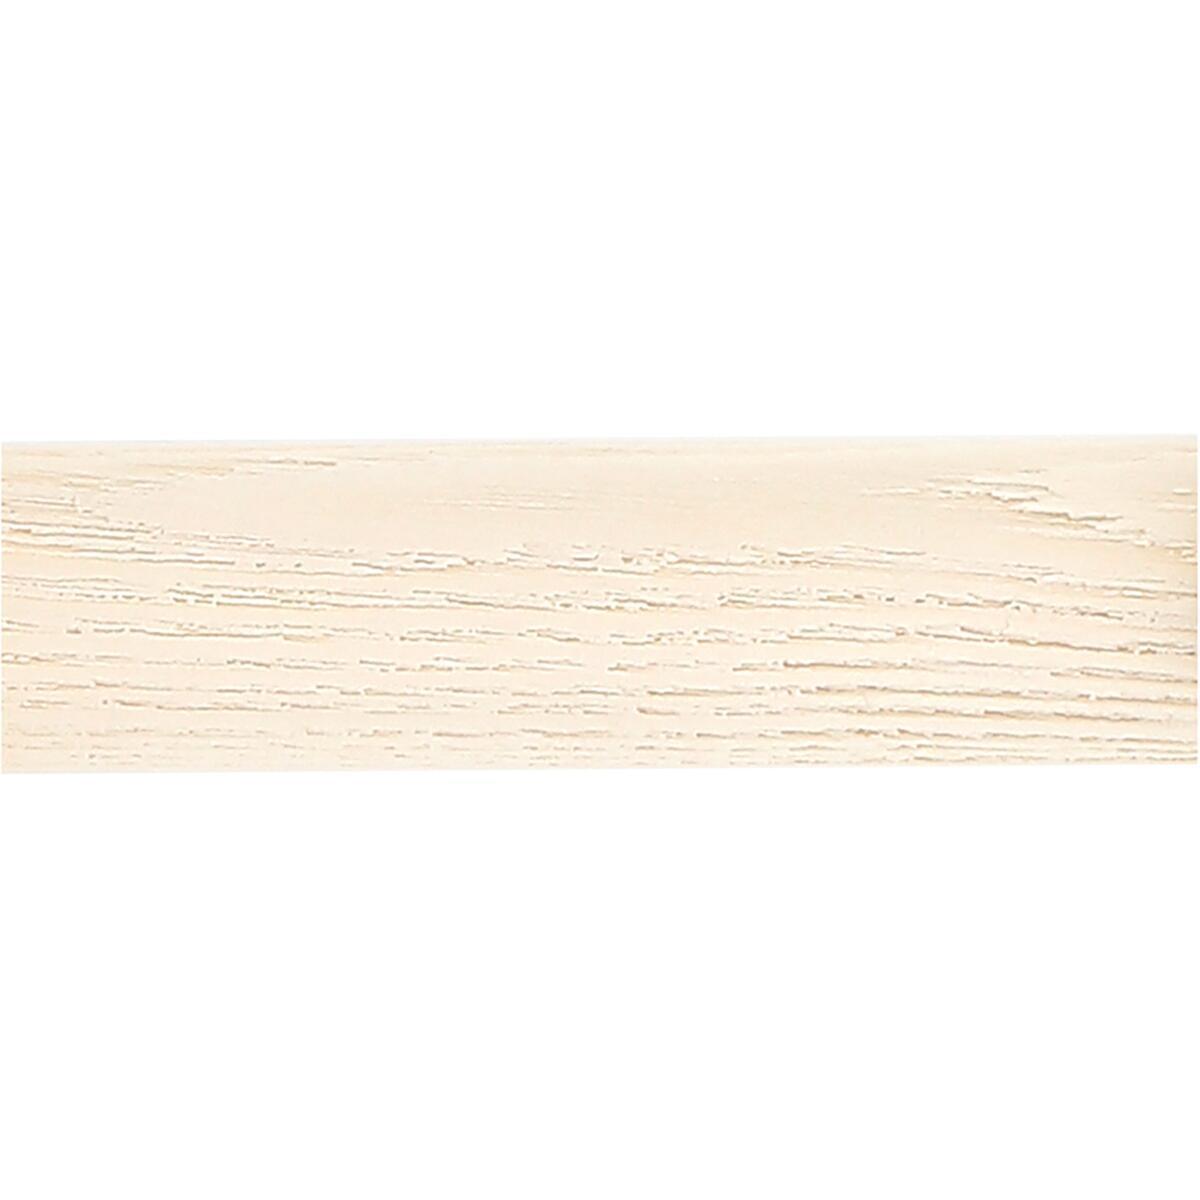 Bastone per tenda Boheme in frassino Ø 28 mm sabbia sbiancato 250 cm - 4